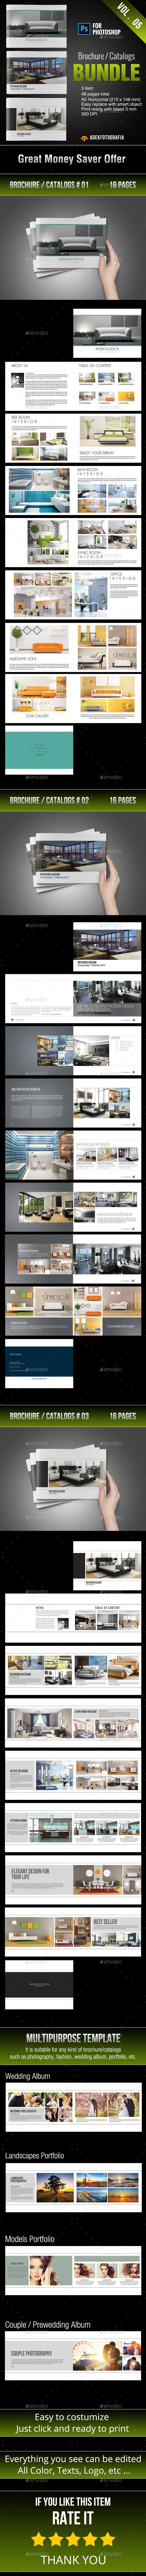 Multipurpose Catalogs / Brochure Bundle Vol. 05 - Catalogs Brochures